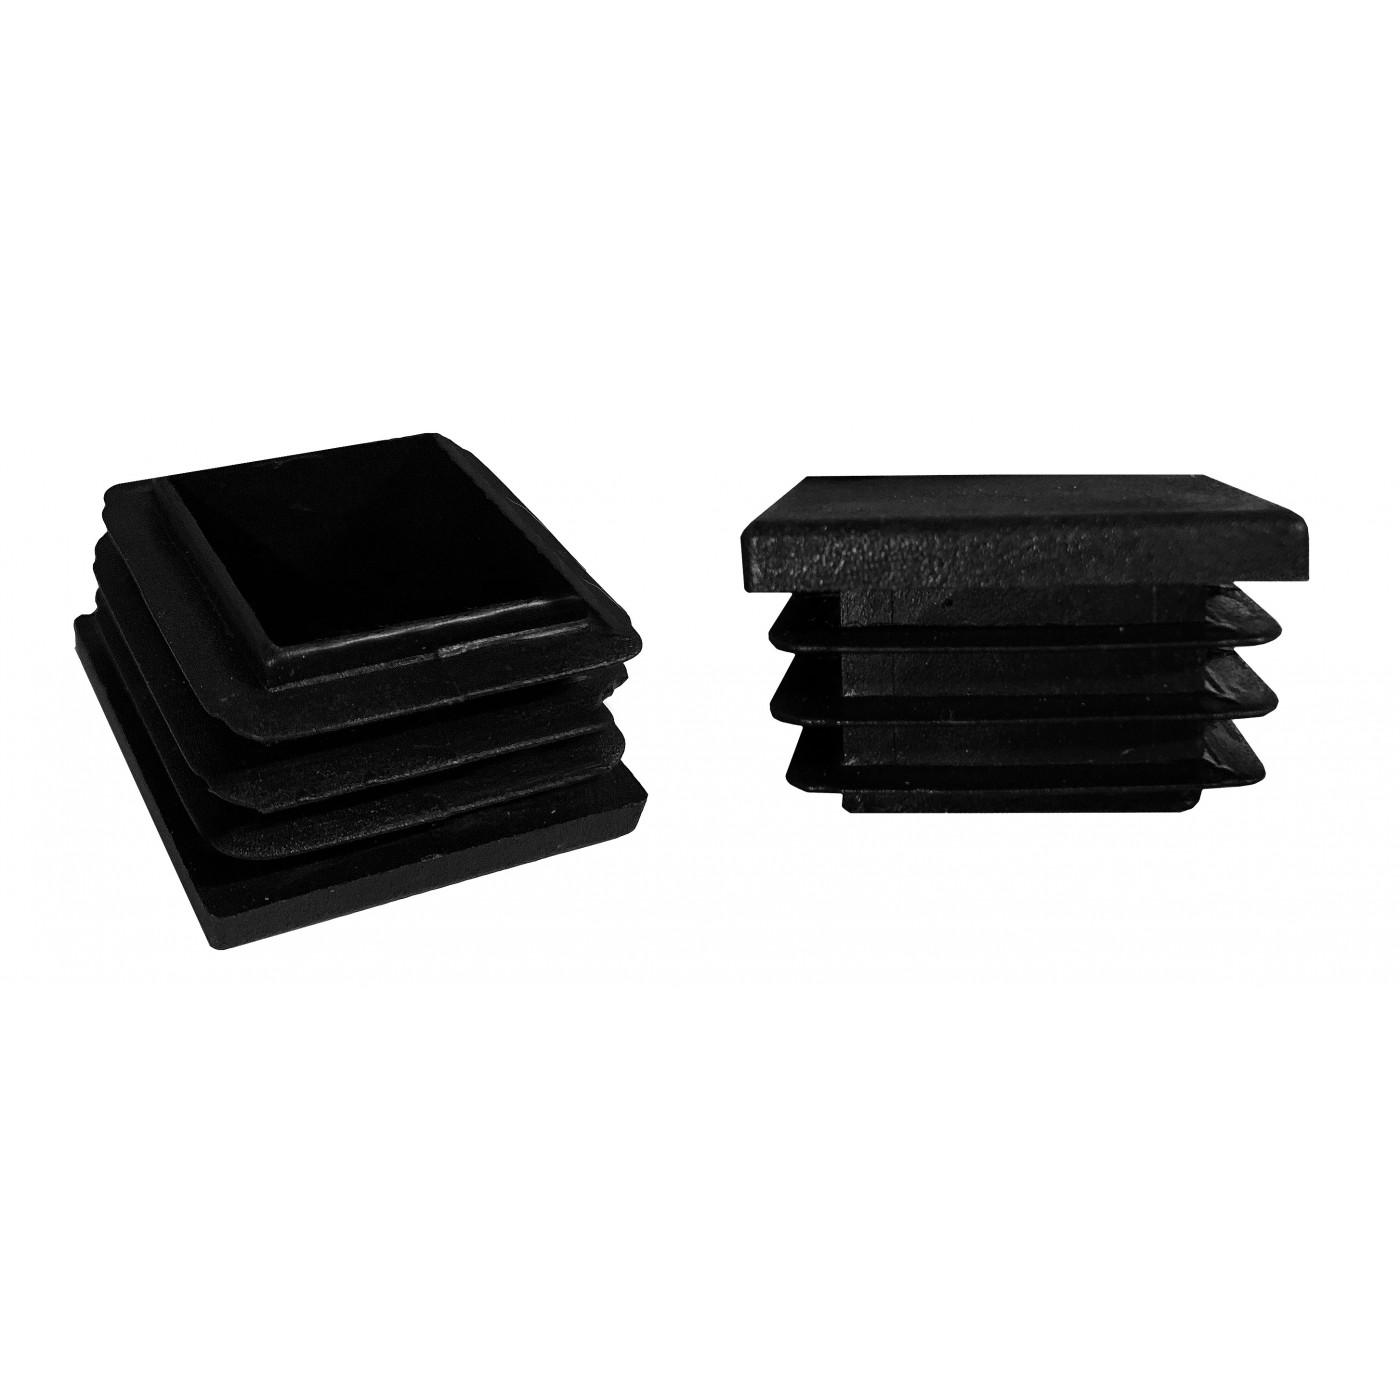 Set of 50 chair leg caps (F20/E29/D30, black)  - 1